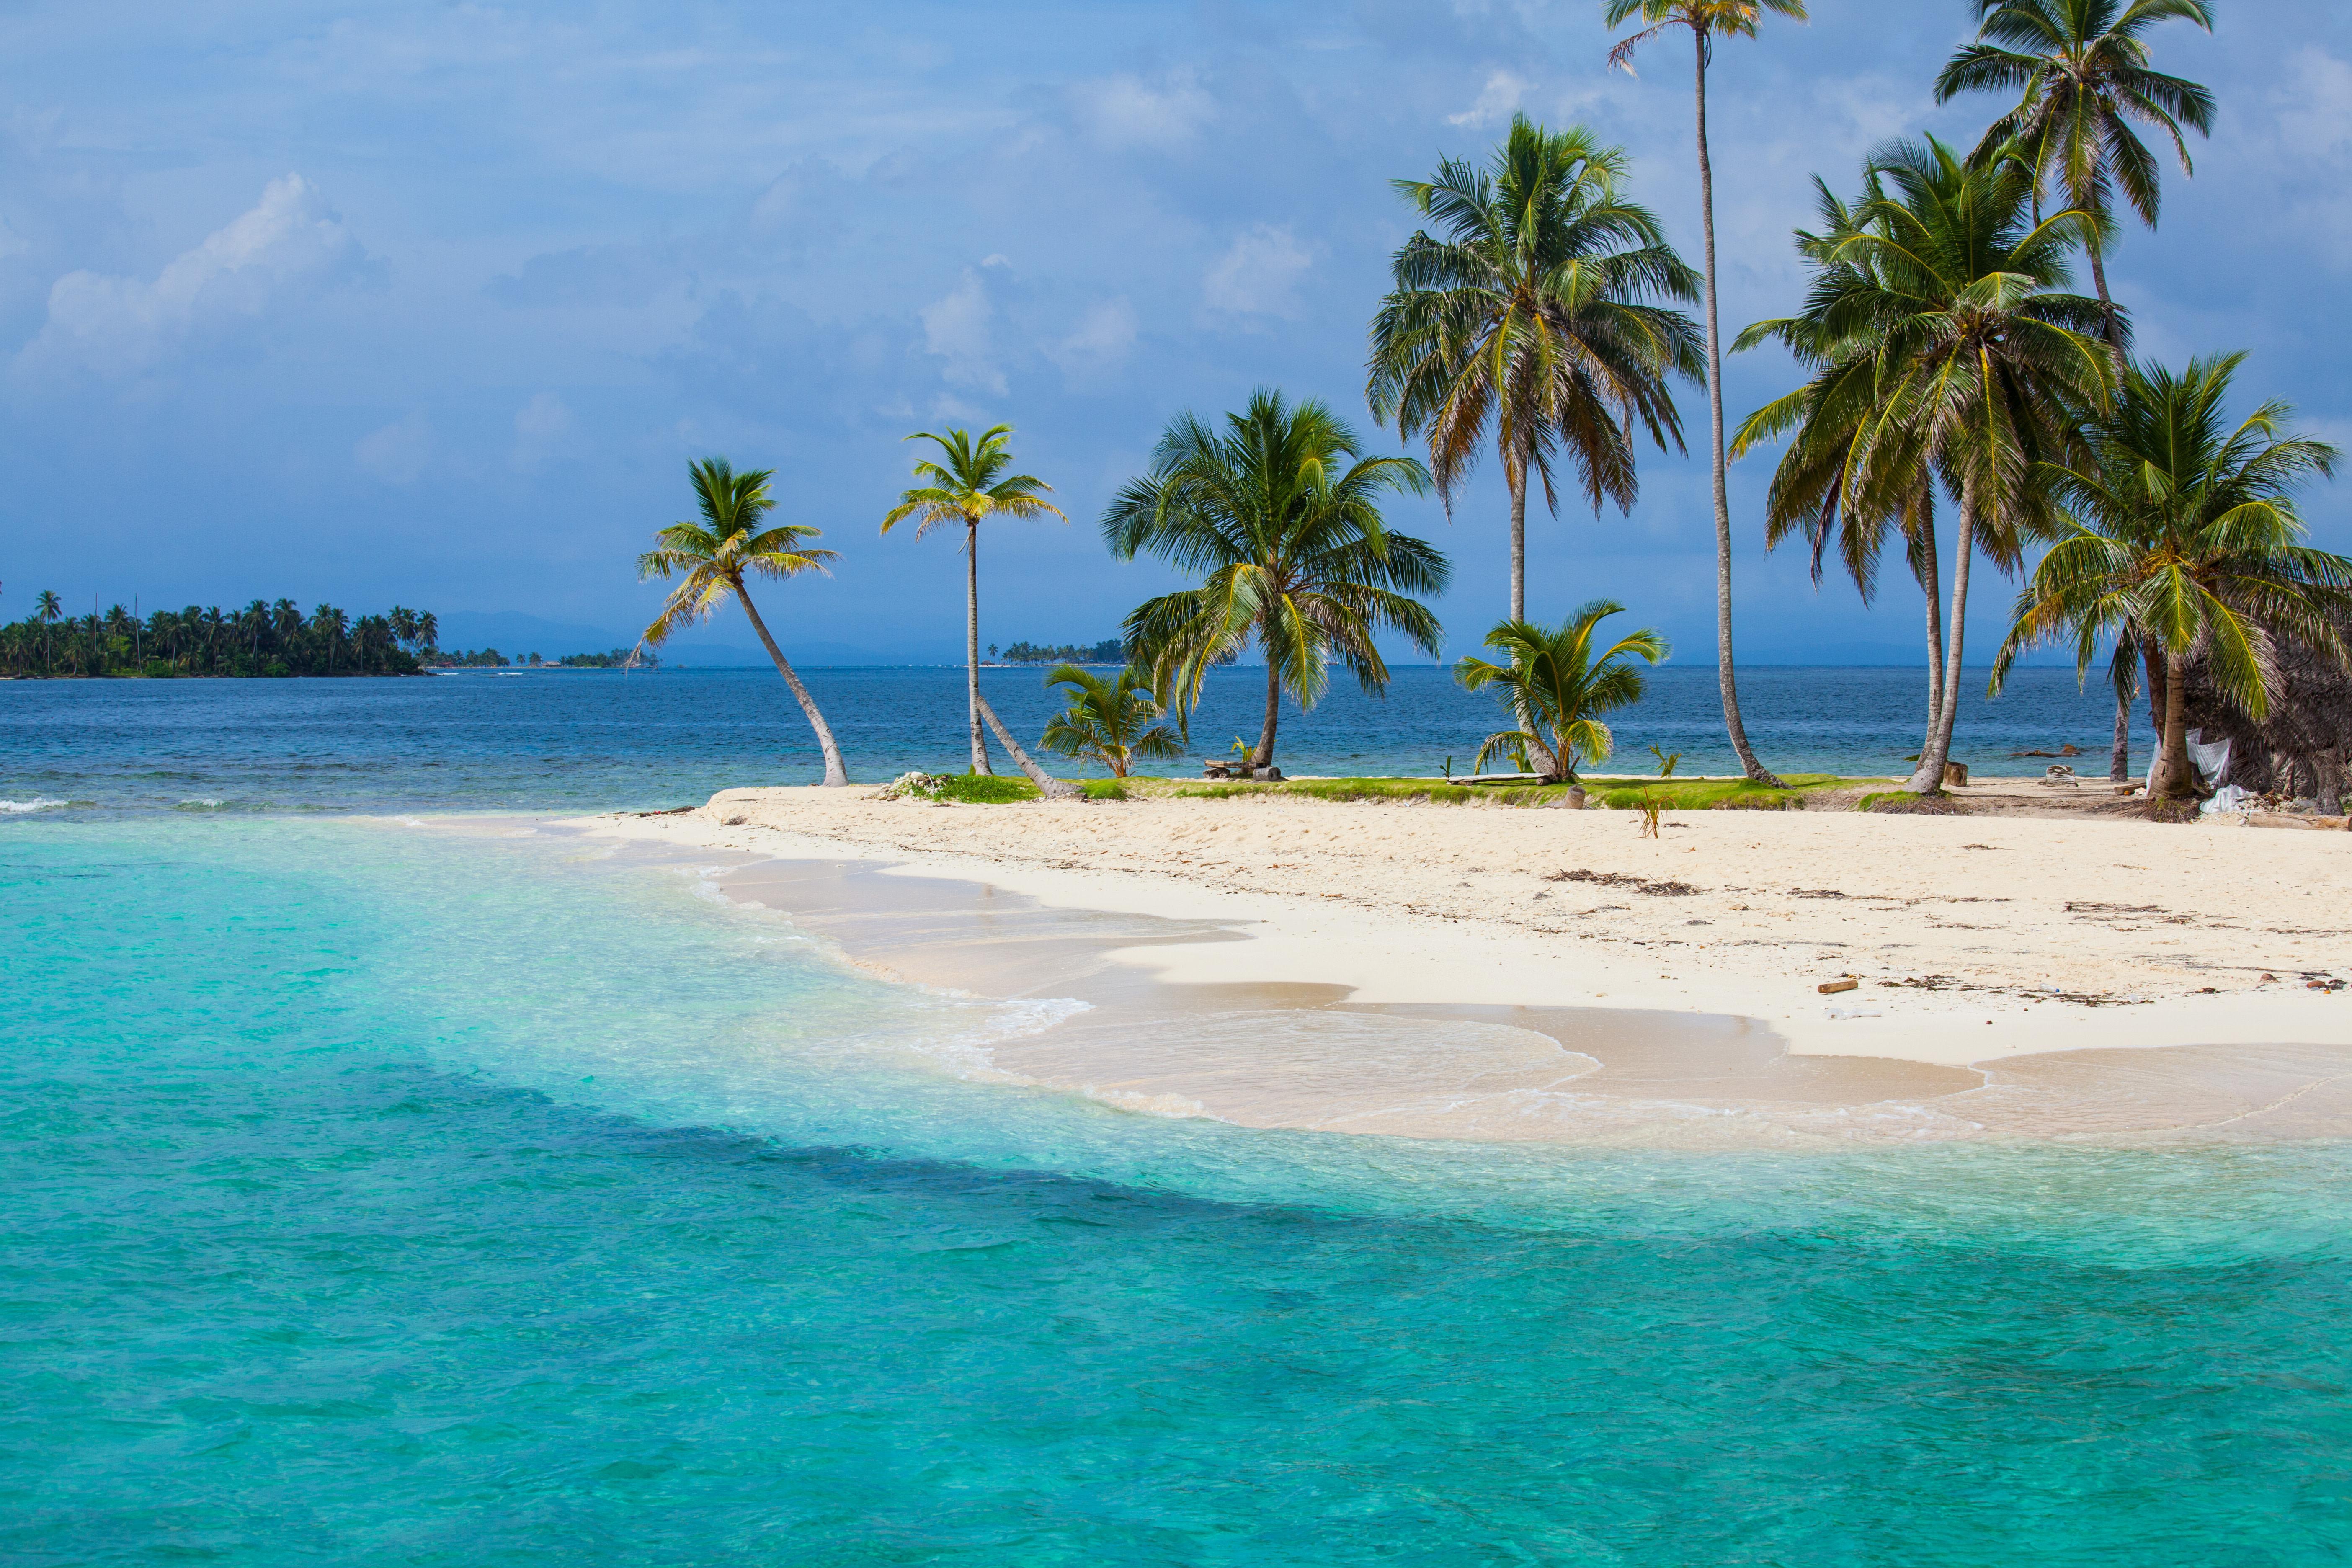 San Blas Islands in Panama